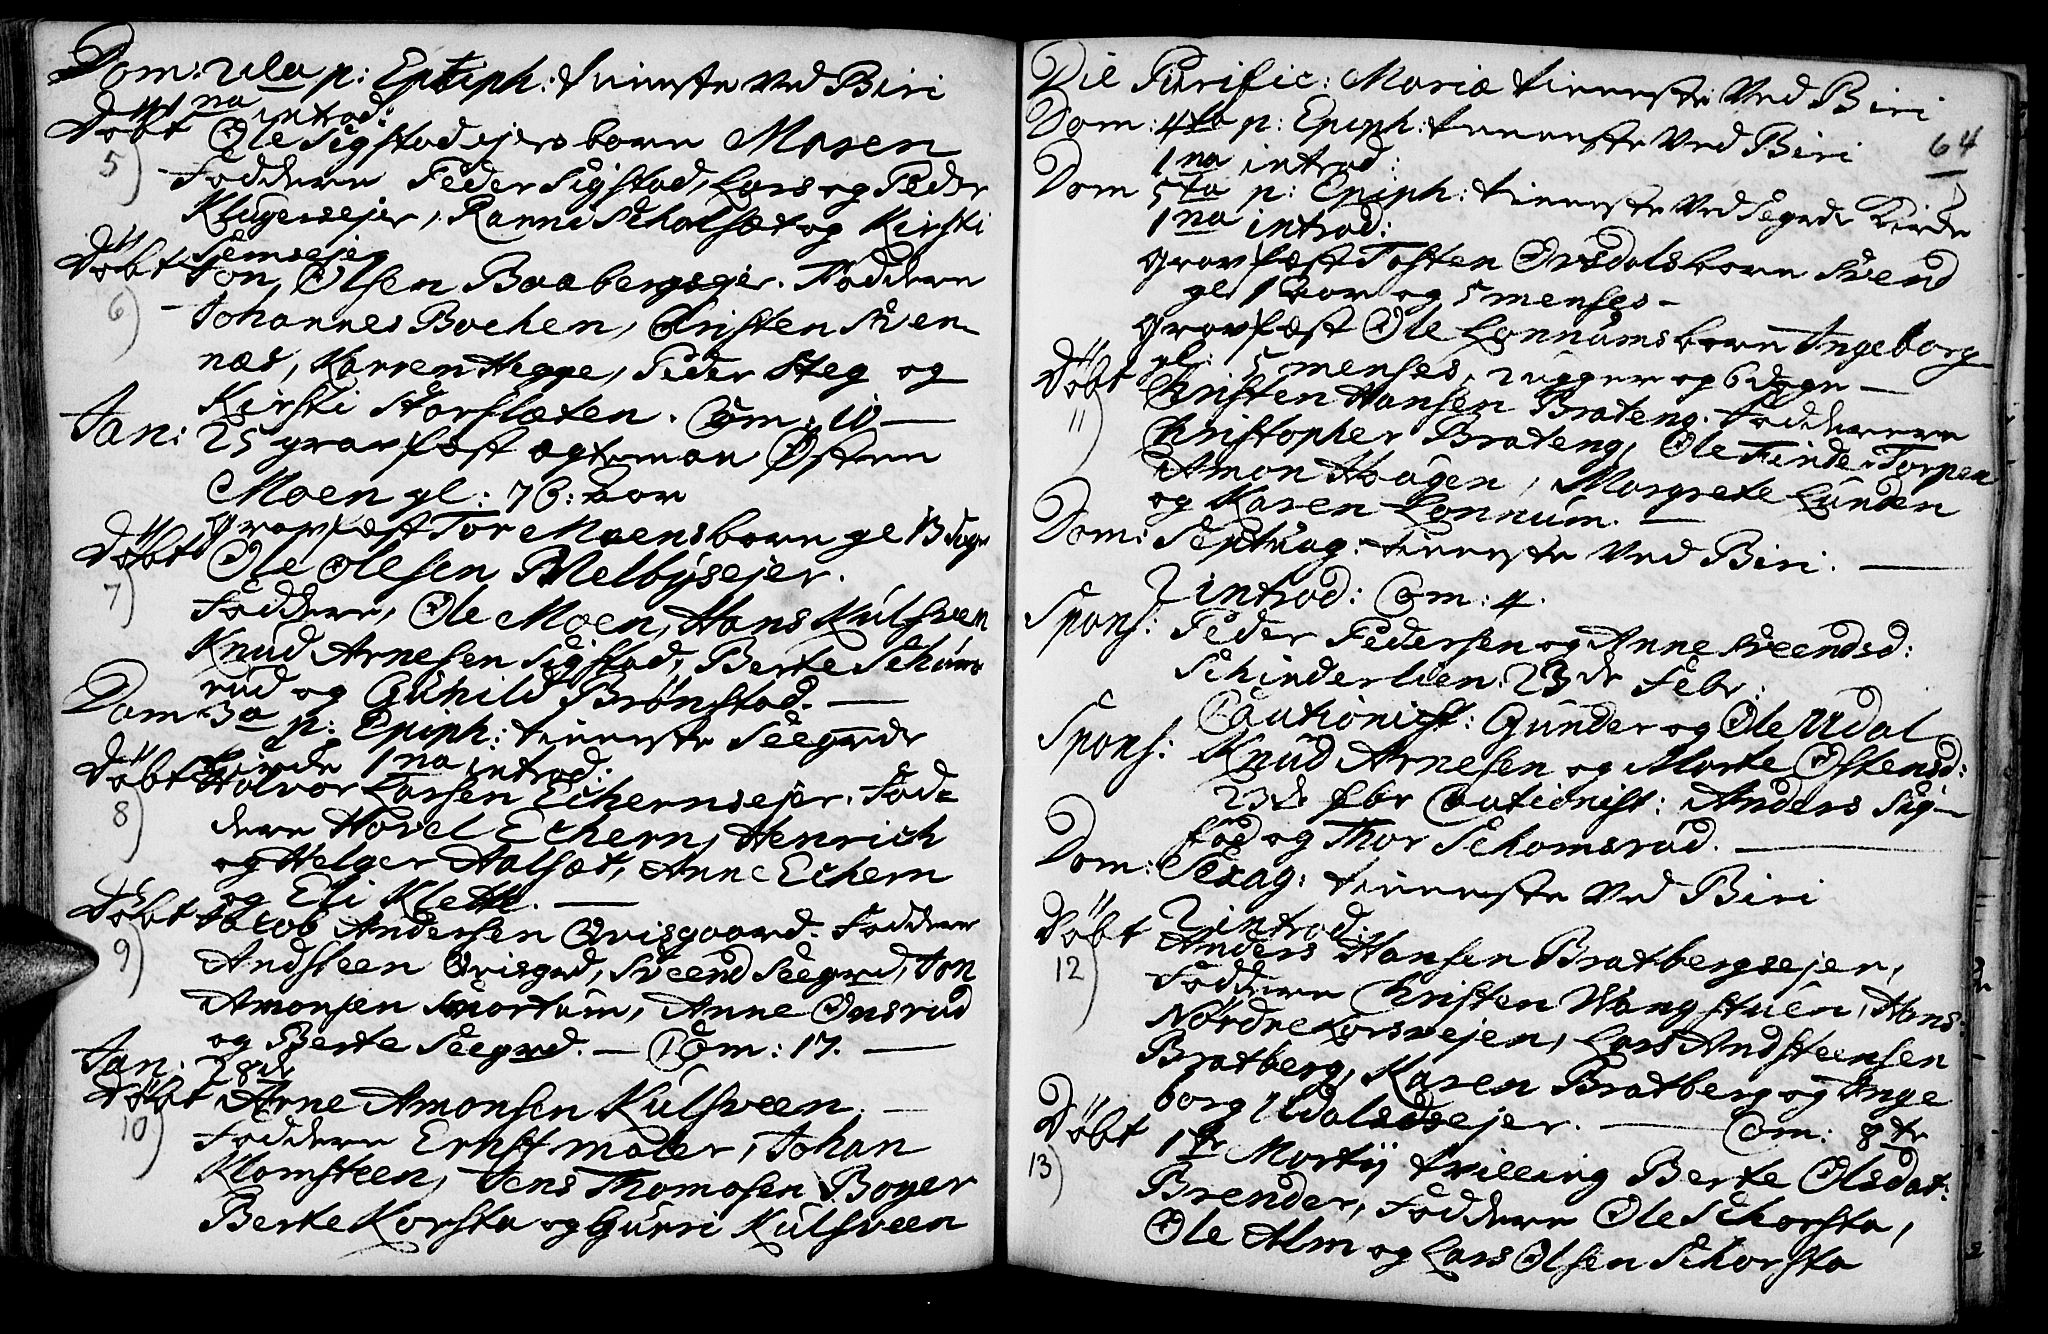 SAH, Biri prestekontor, Ministerialbok nr. 1, 1730-1754, s. 64